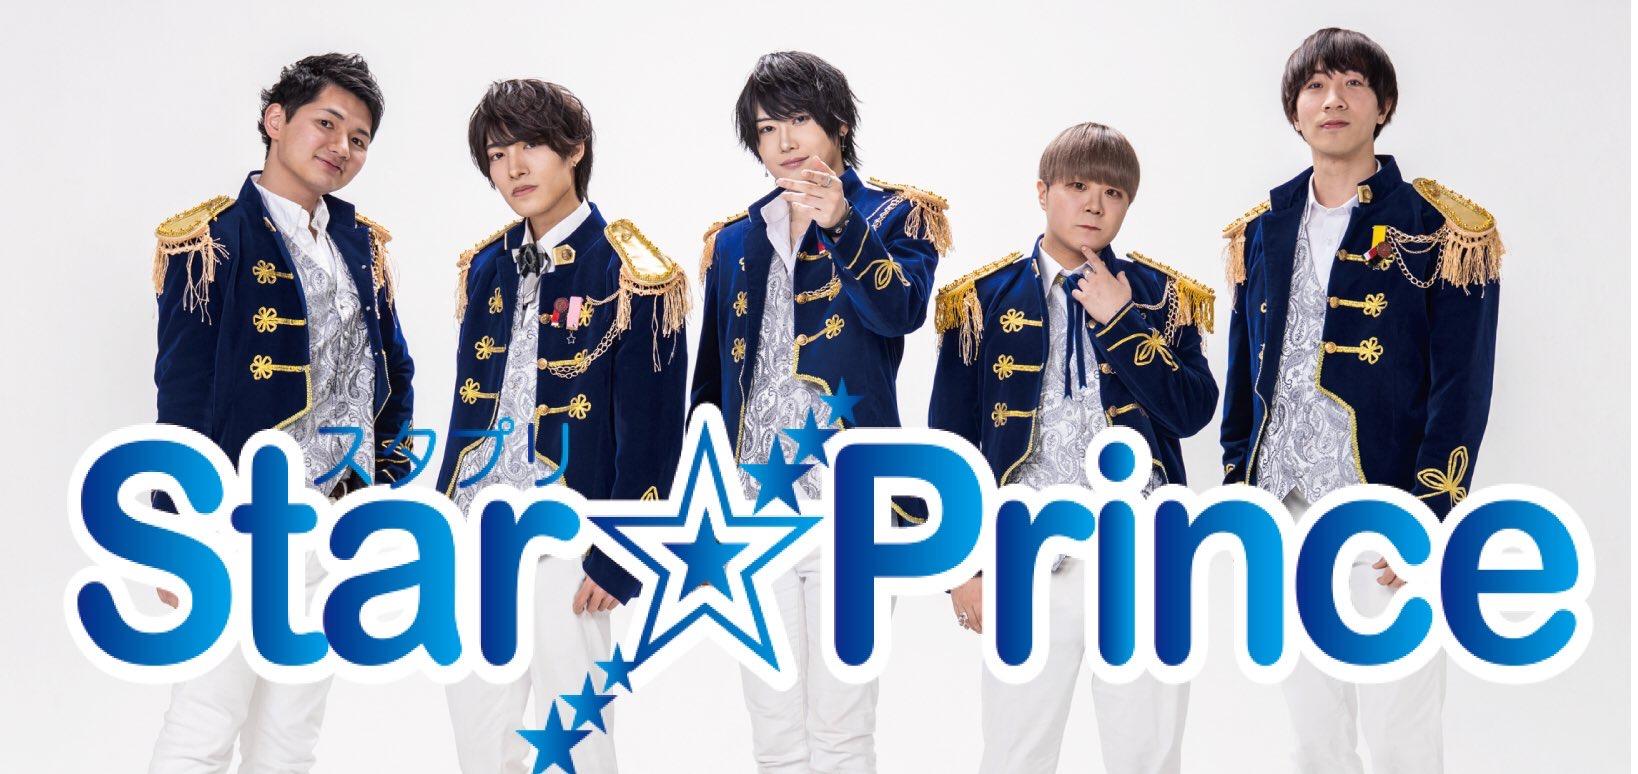 Galaxy Boys 出張公演@天神ポケット